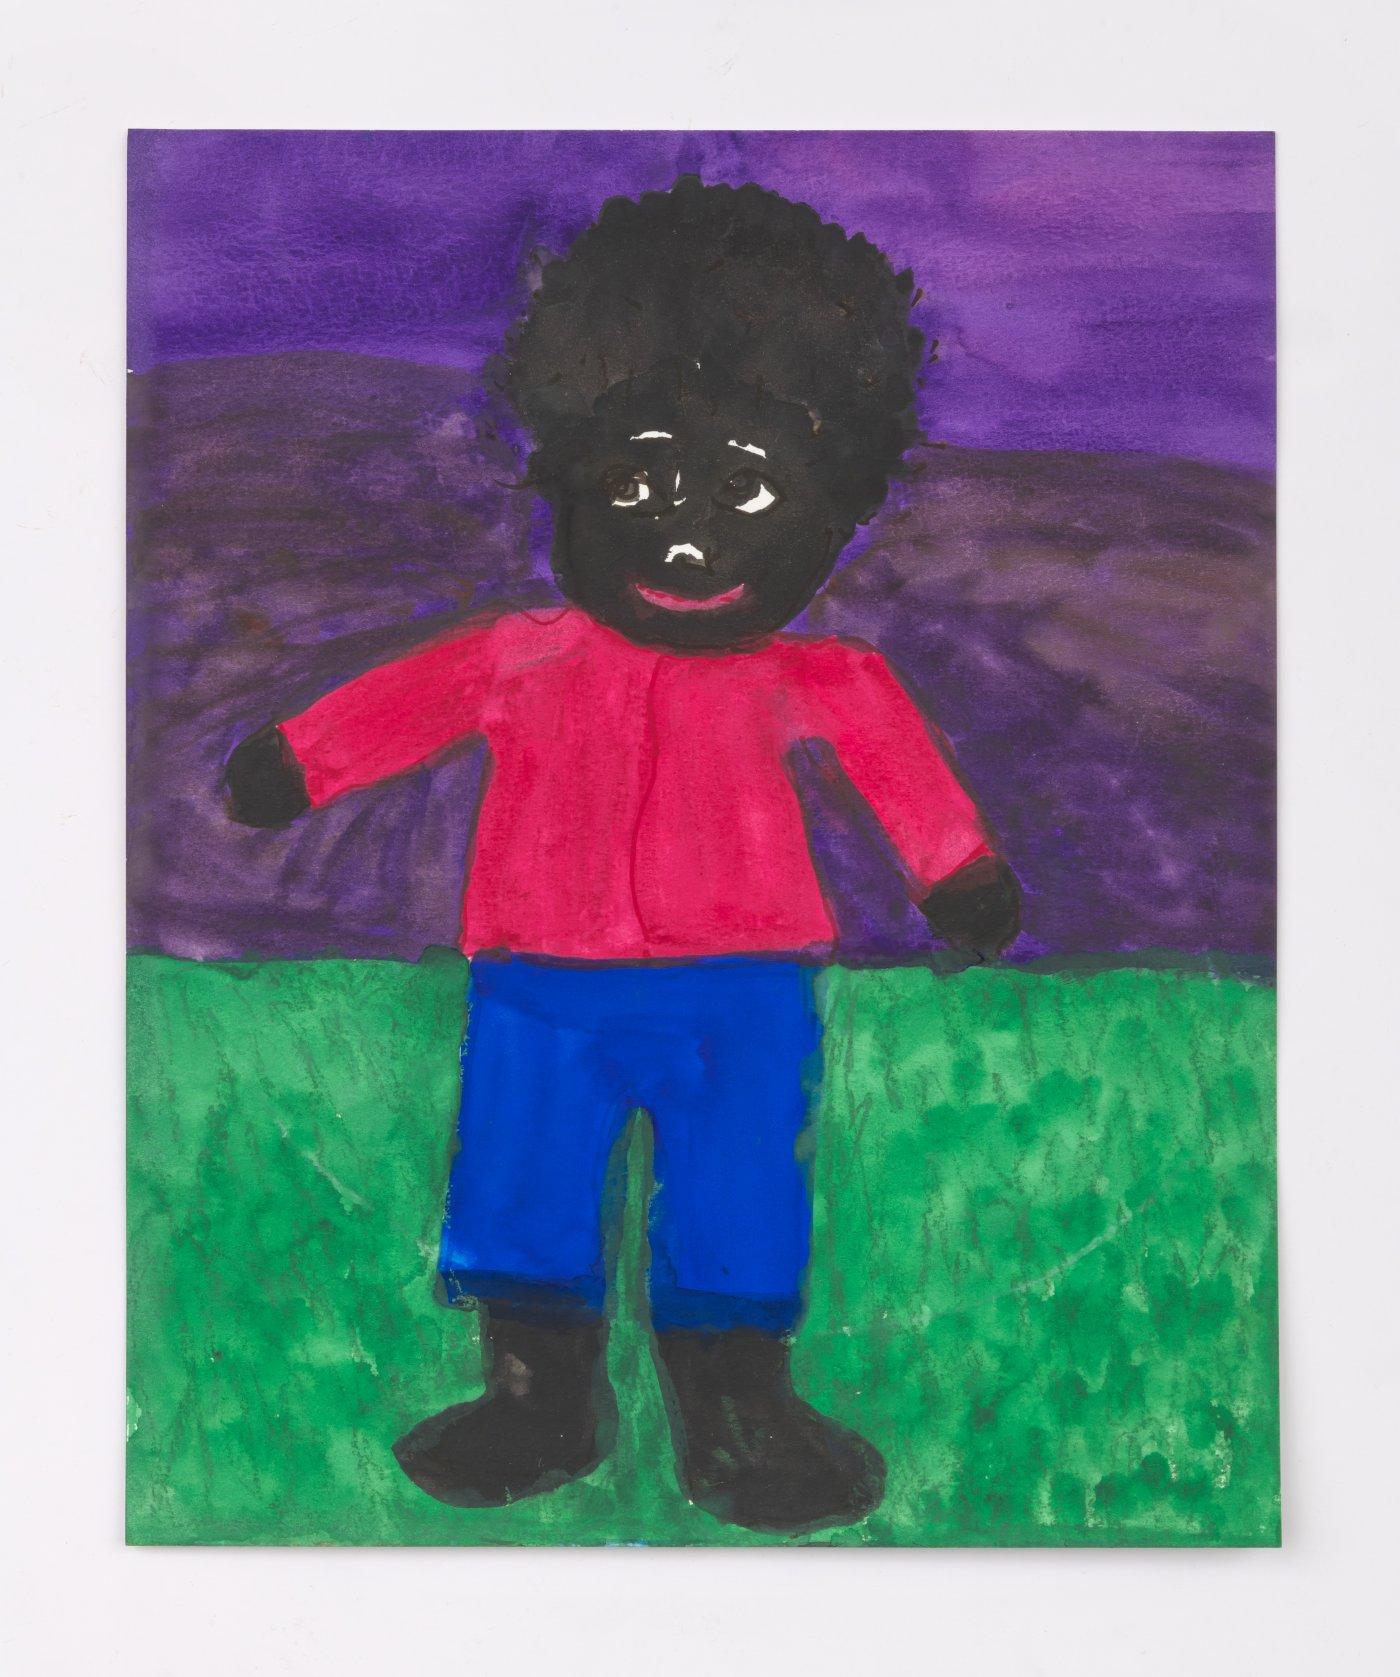 Boy on Green Grass with Purple Sky